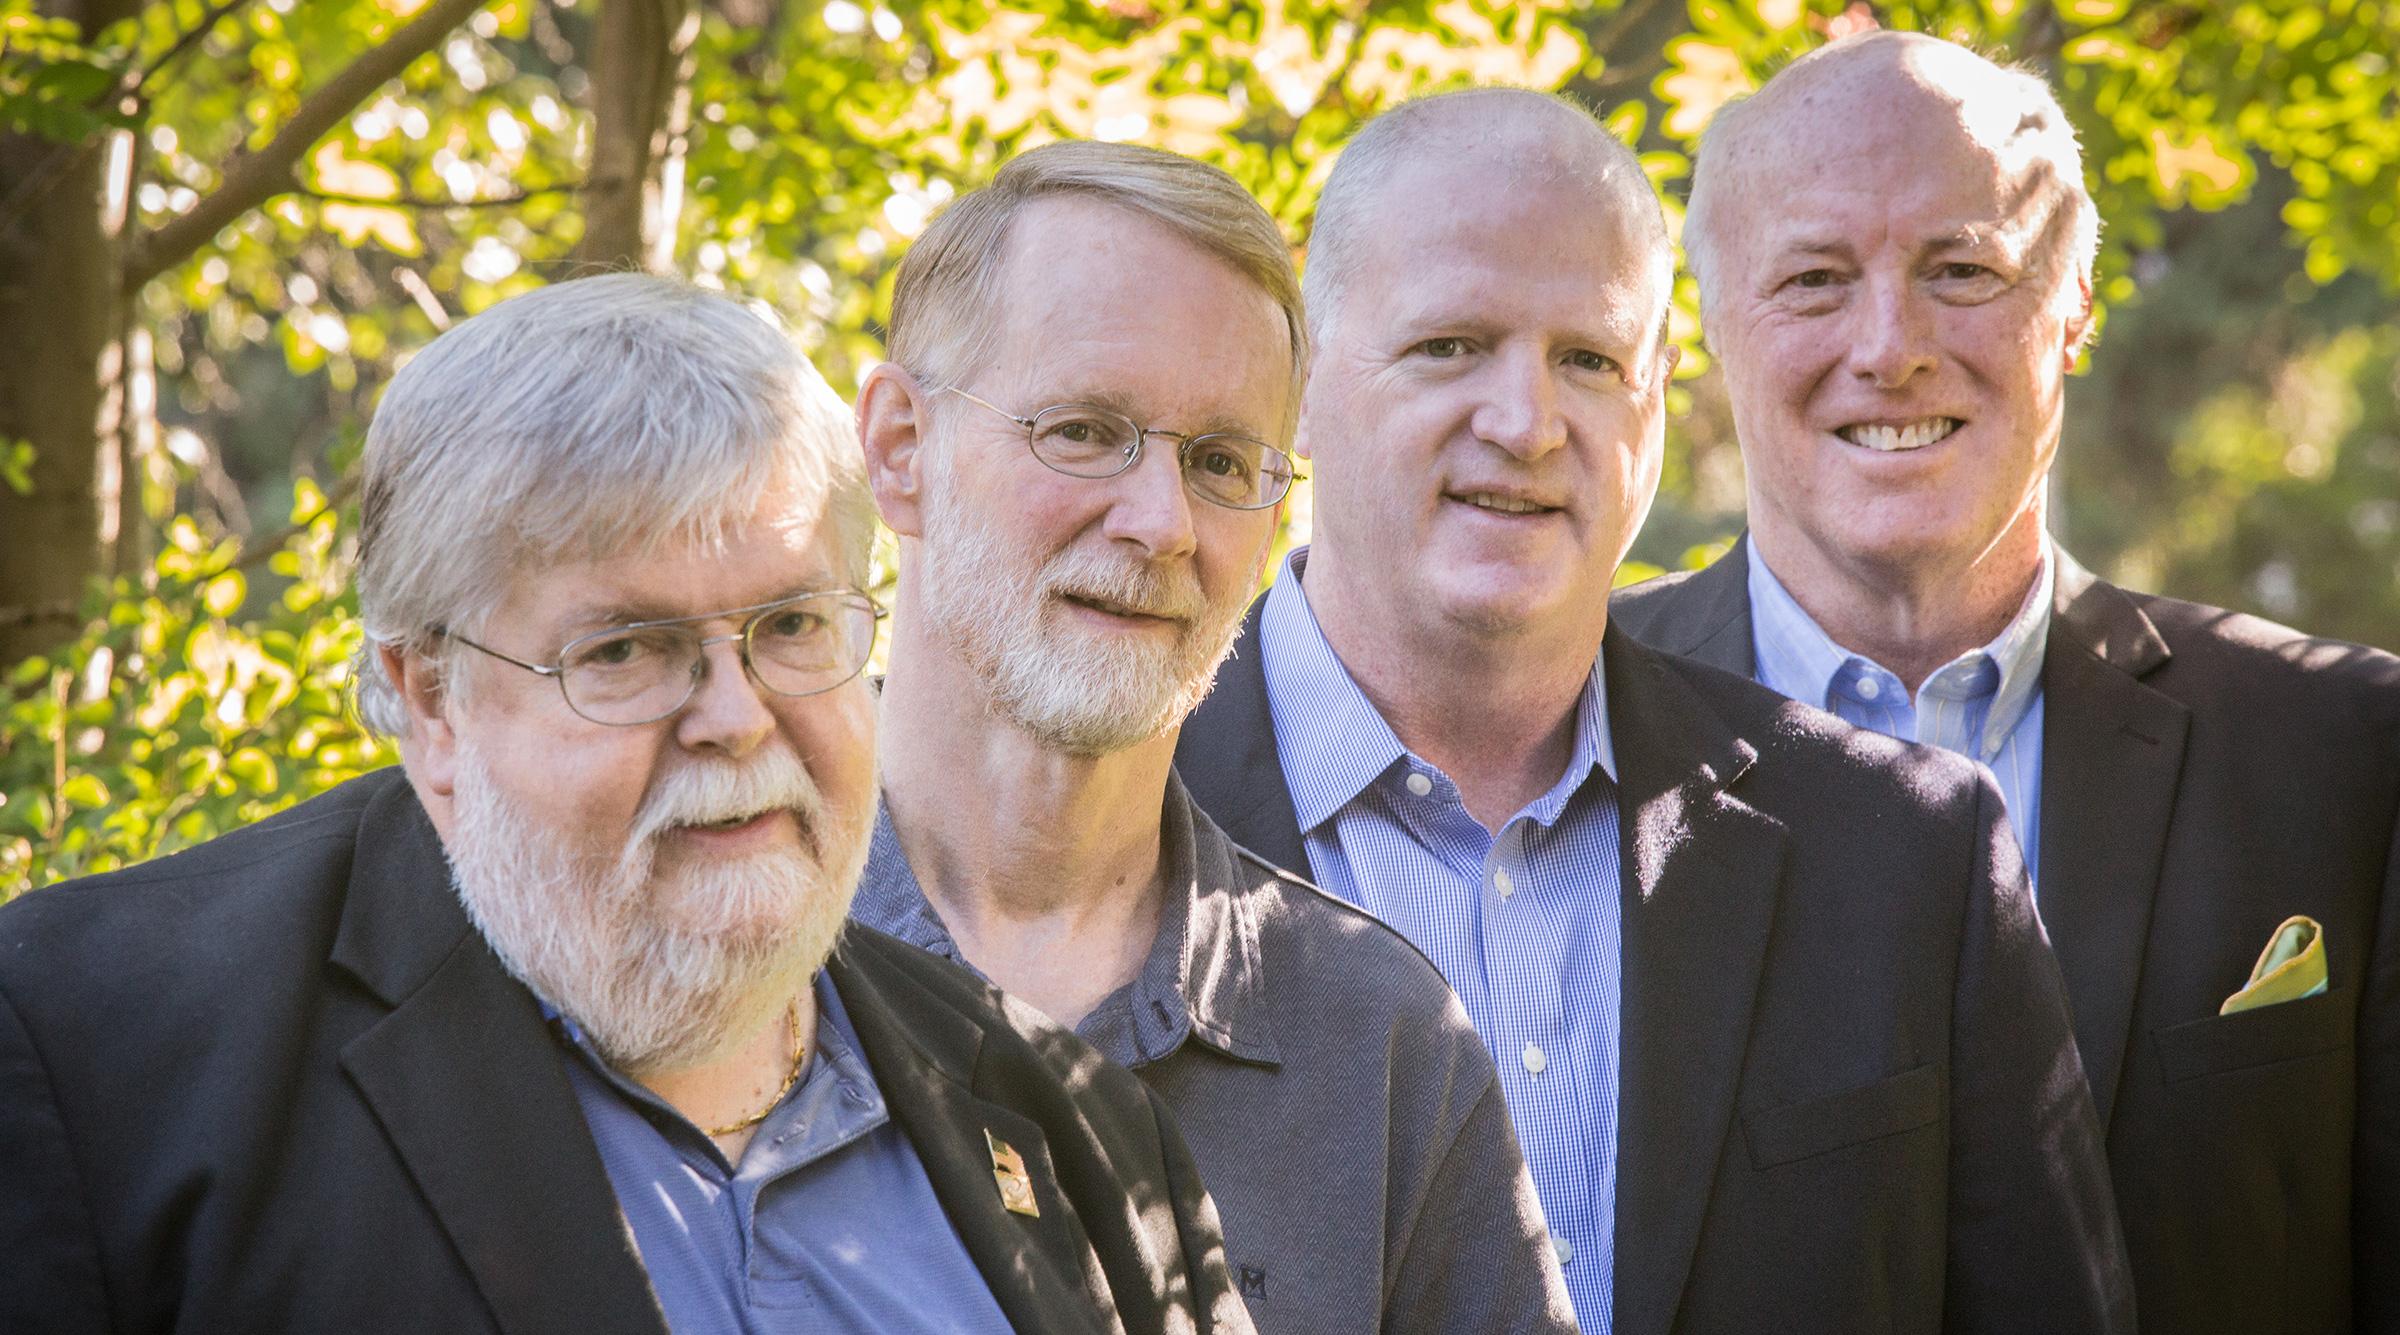 LEFT TO RIGHT:  Maynard Tapp, Mike Jens, Pat McQuillan, Dave Norton